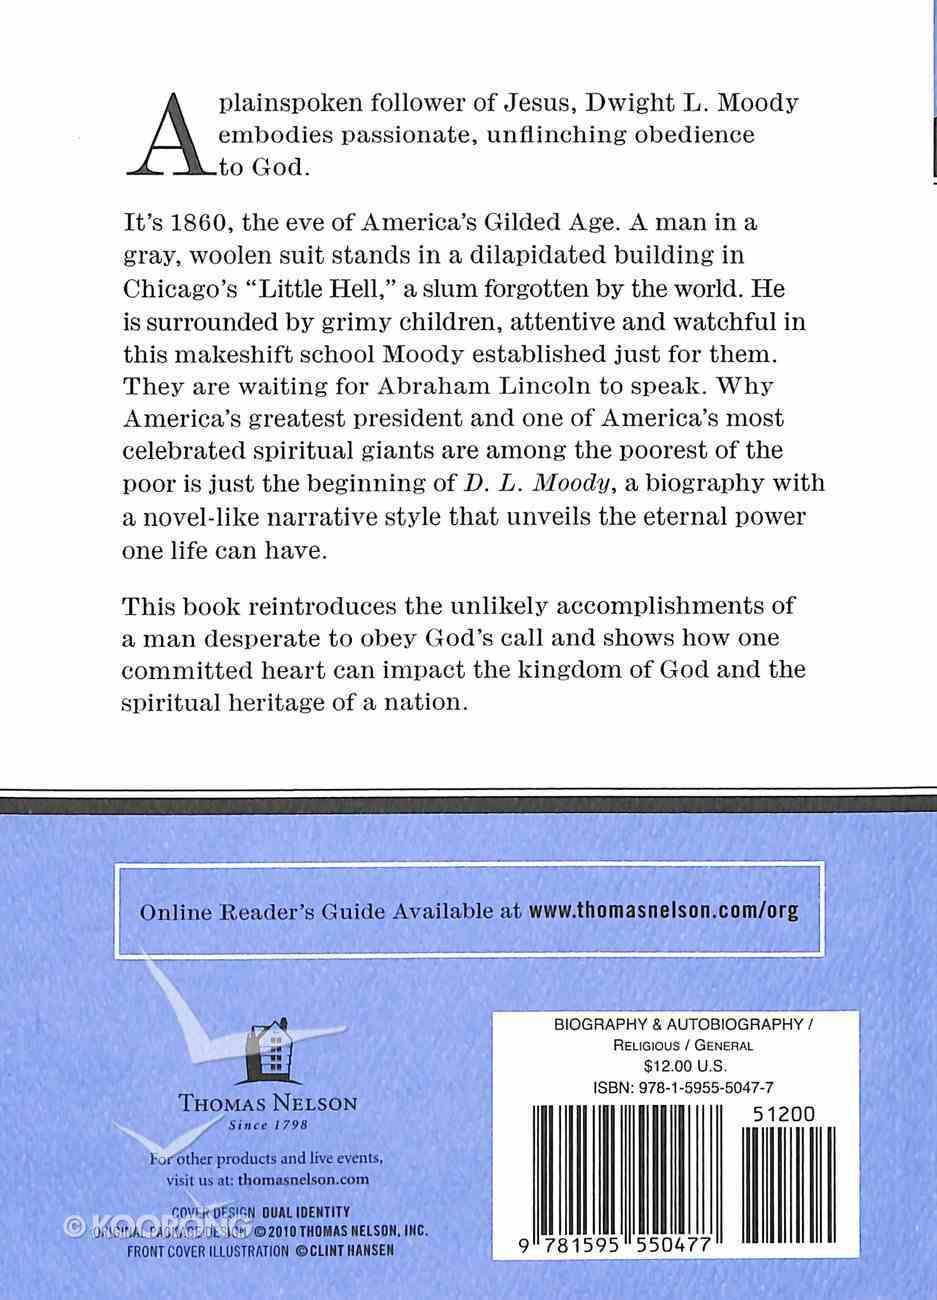 Saints 2-Pack (John Bunyan + Dl Moody) (2) (Christian Encounters Series) Pack